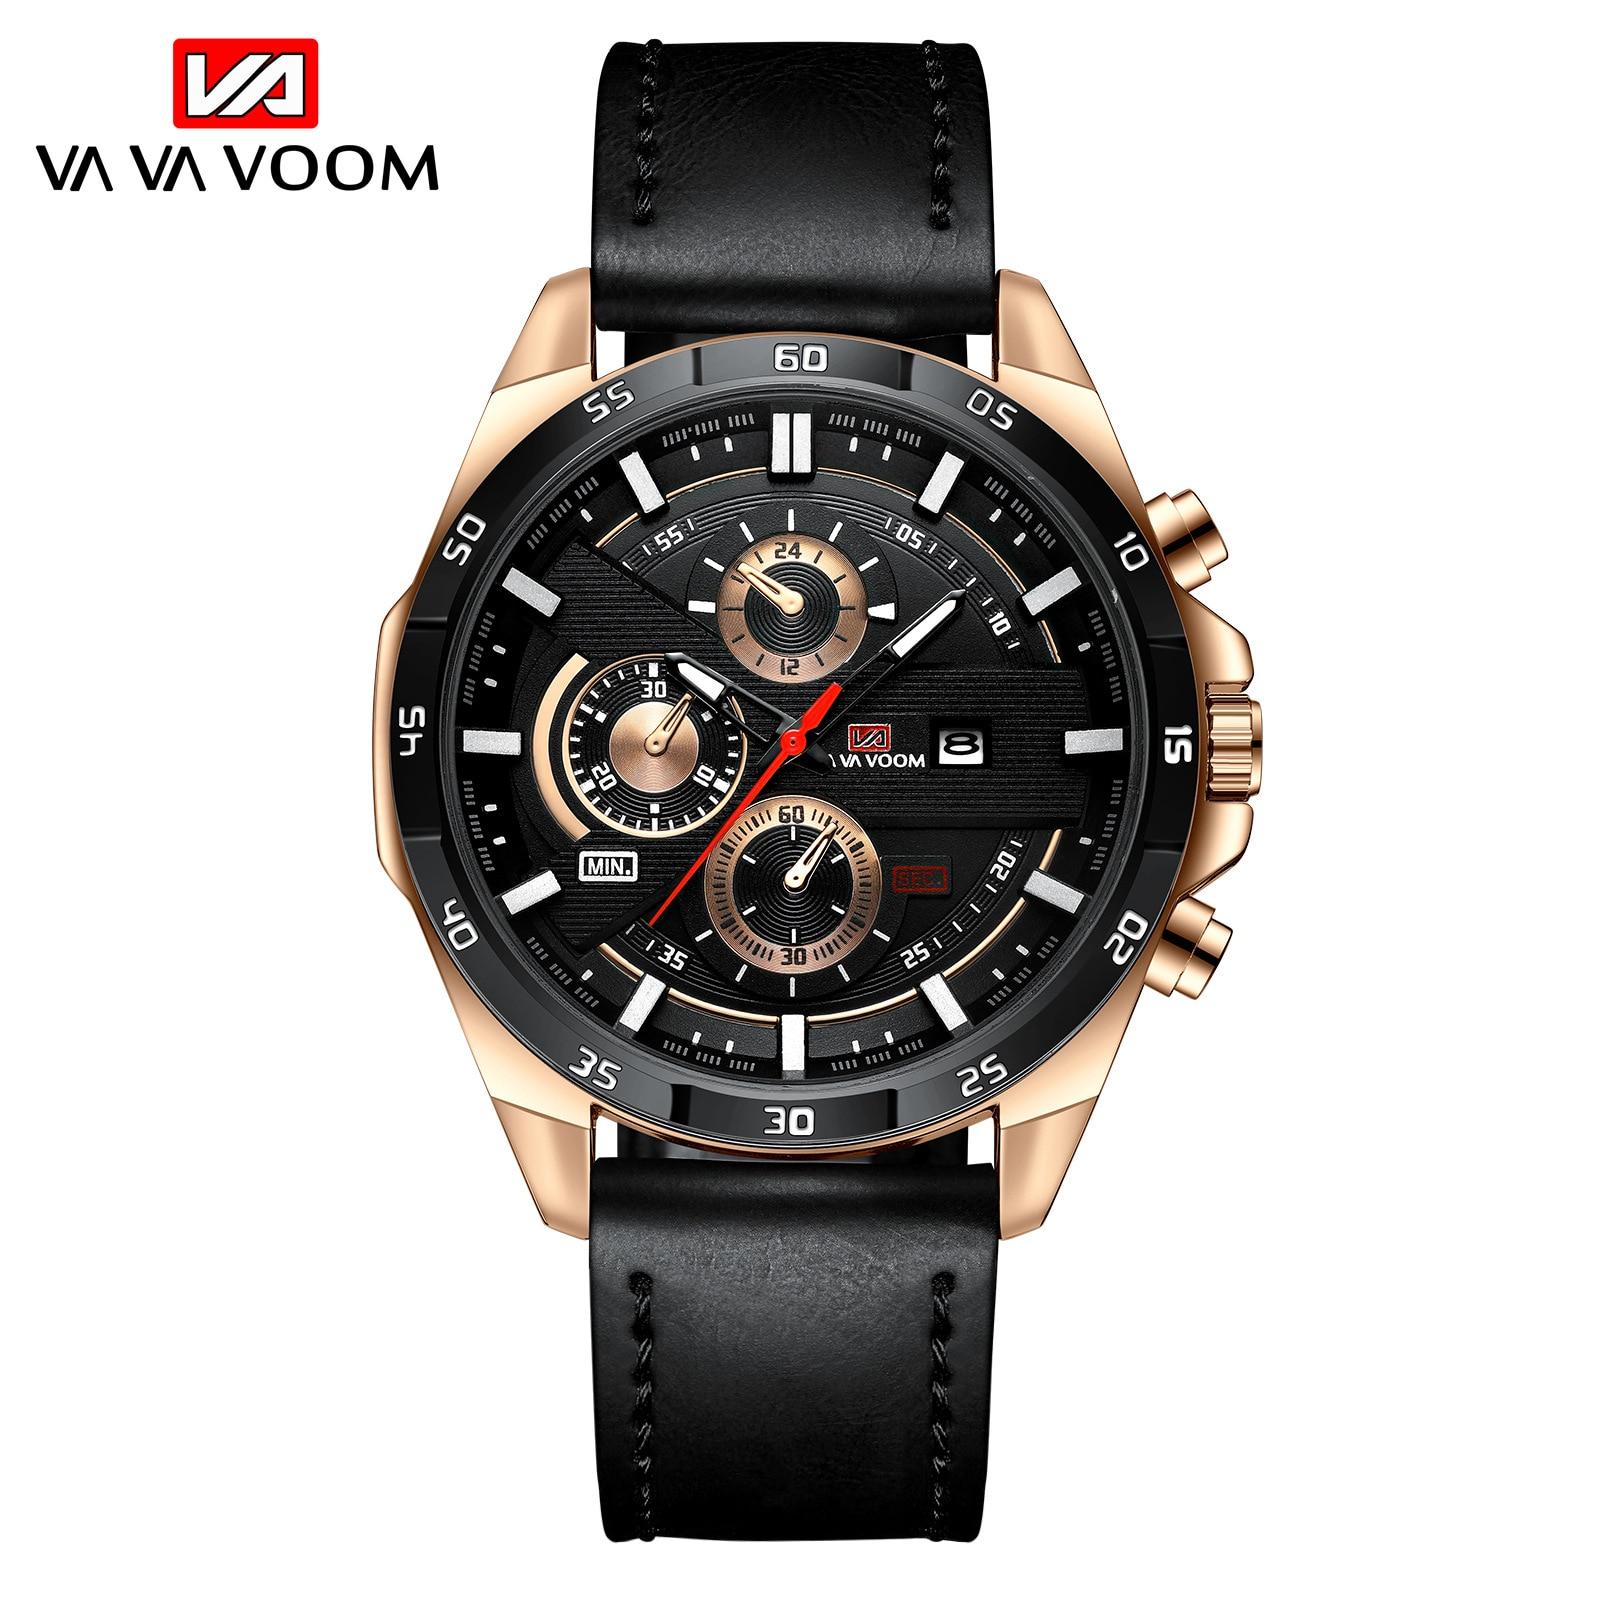 VAVA VOOM Brand Men Quartz Watch Leather Strap Business Wristwatch Men Military Casual Sport Watches Mens Relogio Masculino 2020